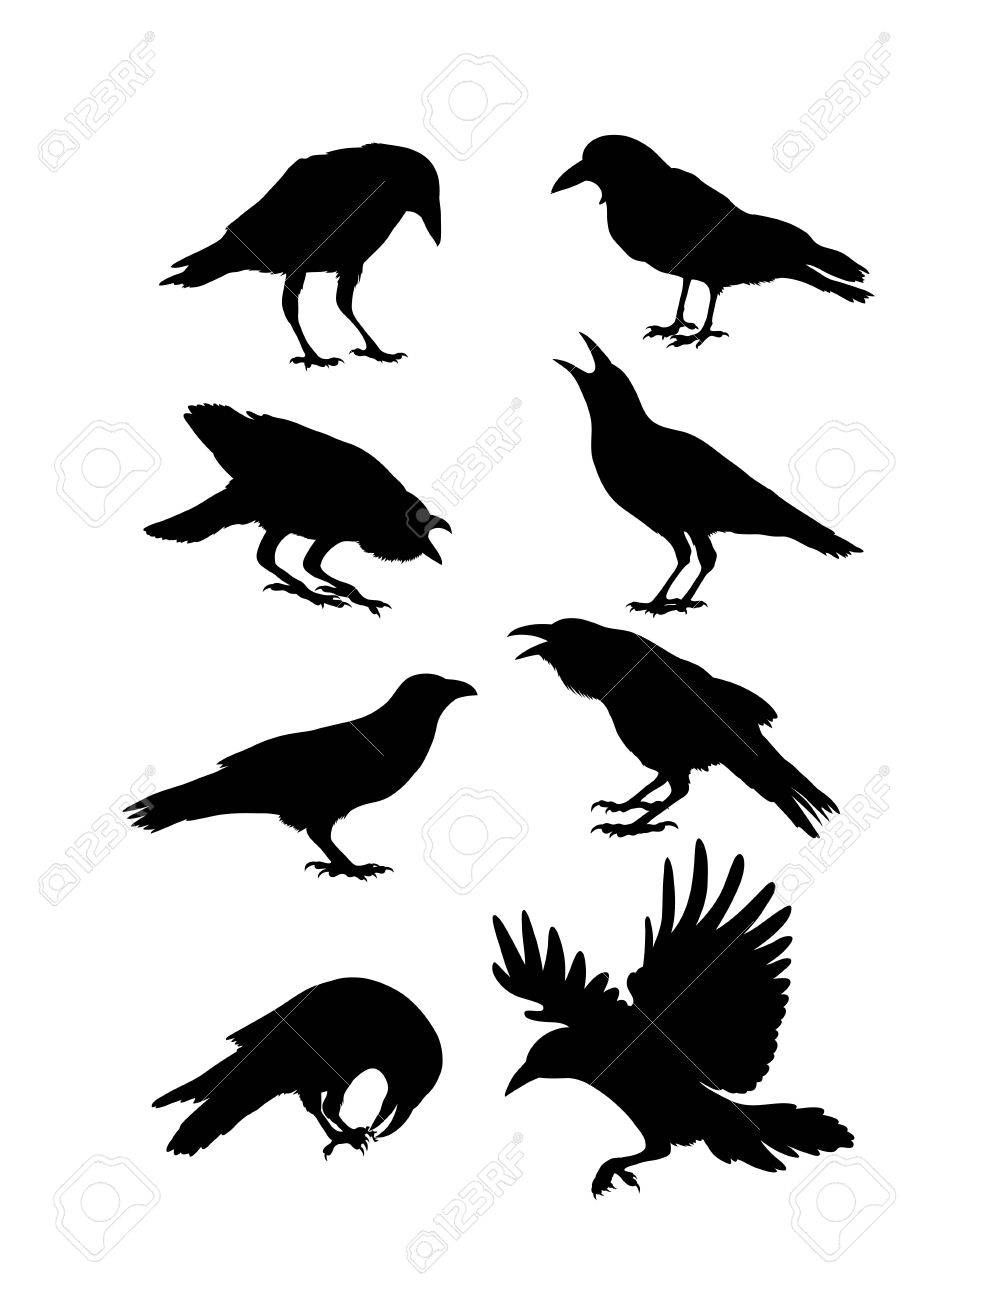 Black Crow Silhouettes Art Design Crow Silhouette Crow Painting Crow Art